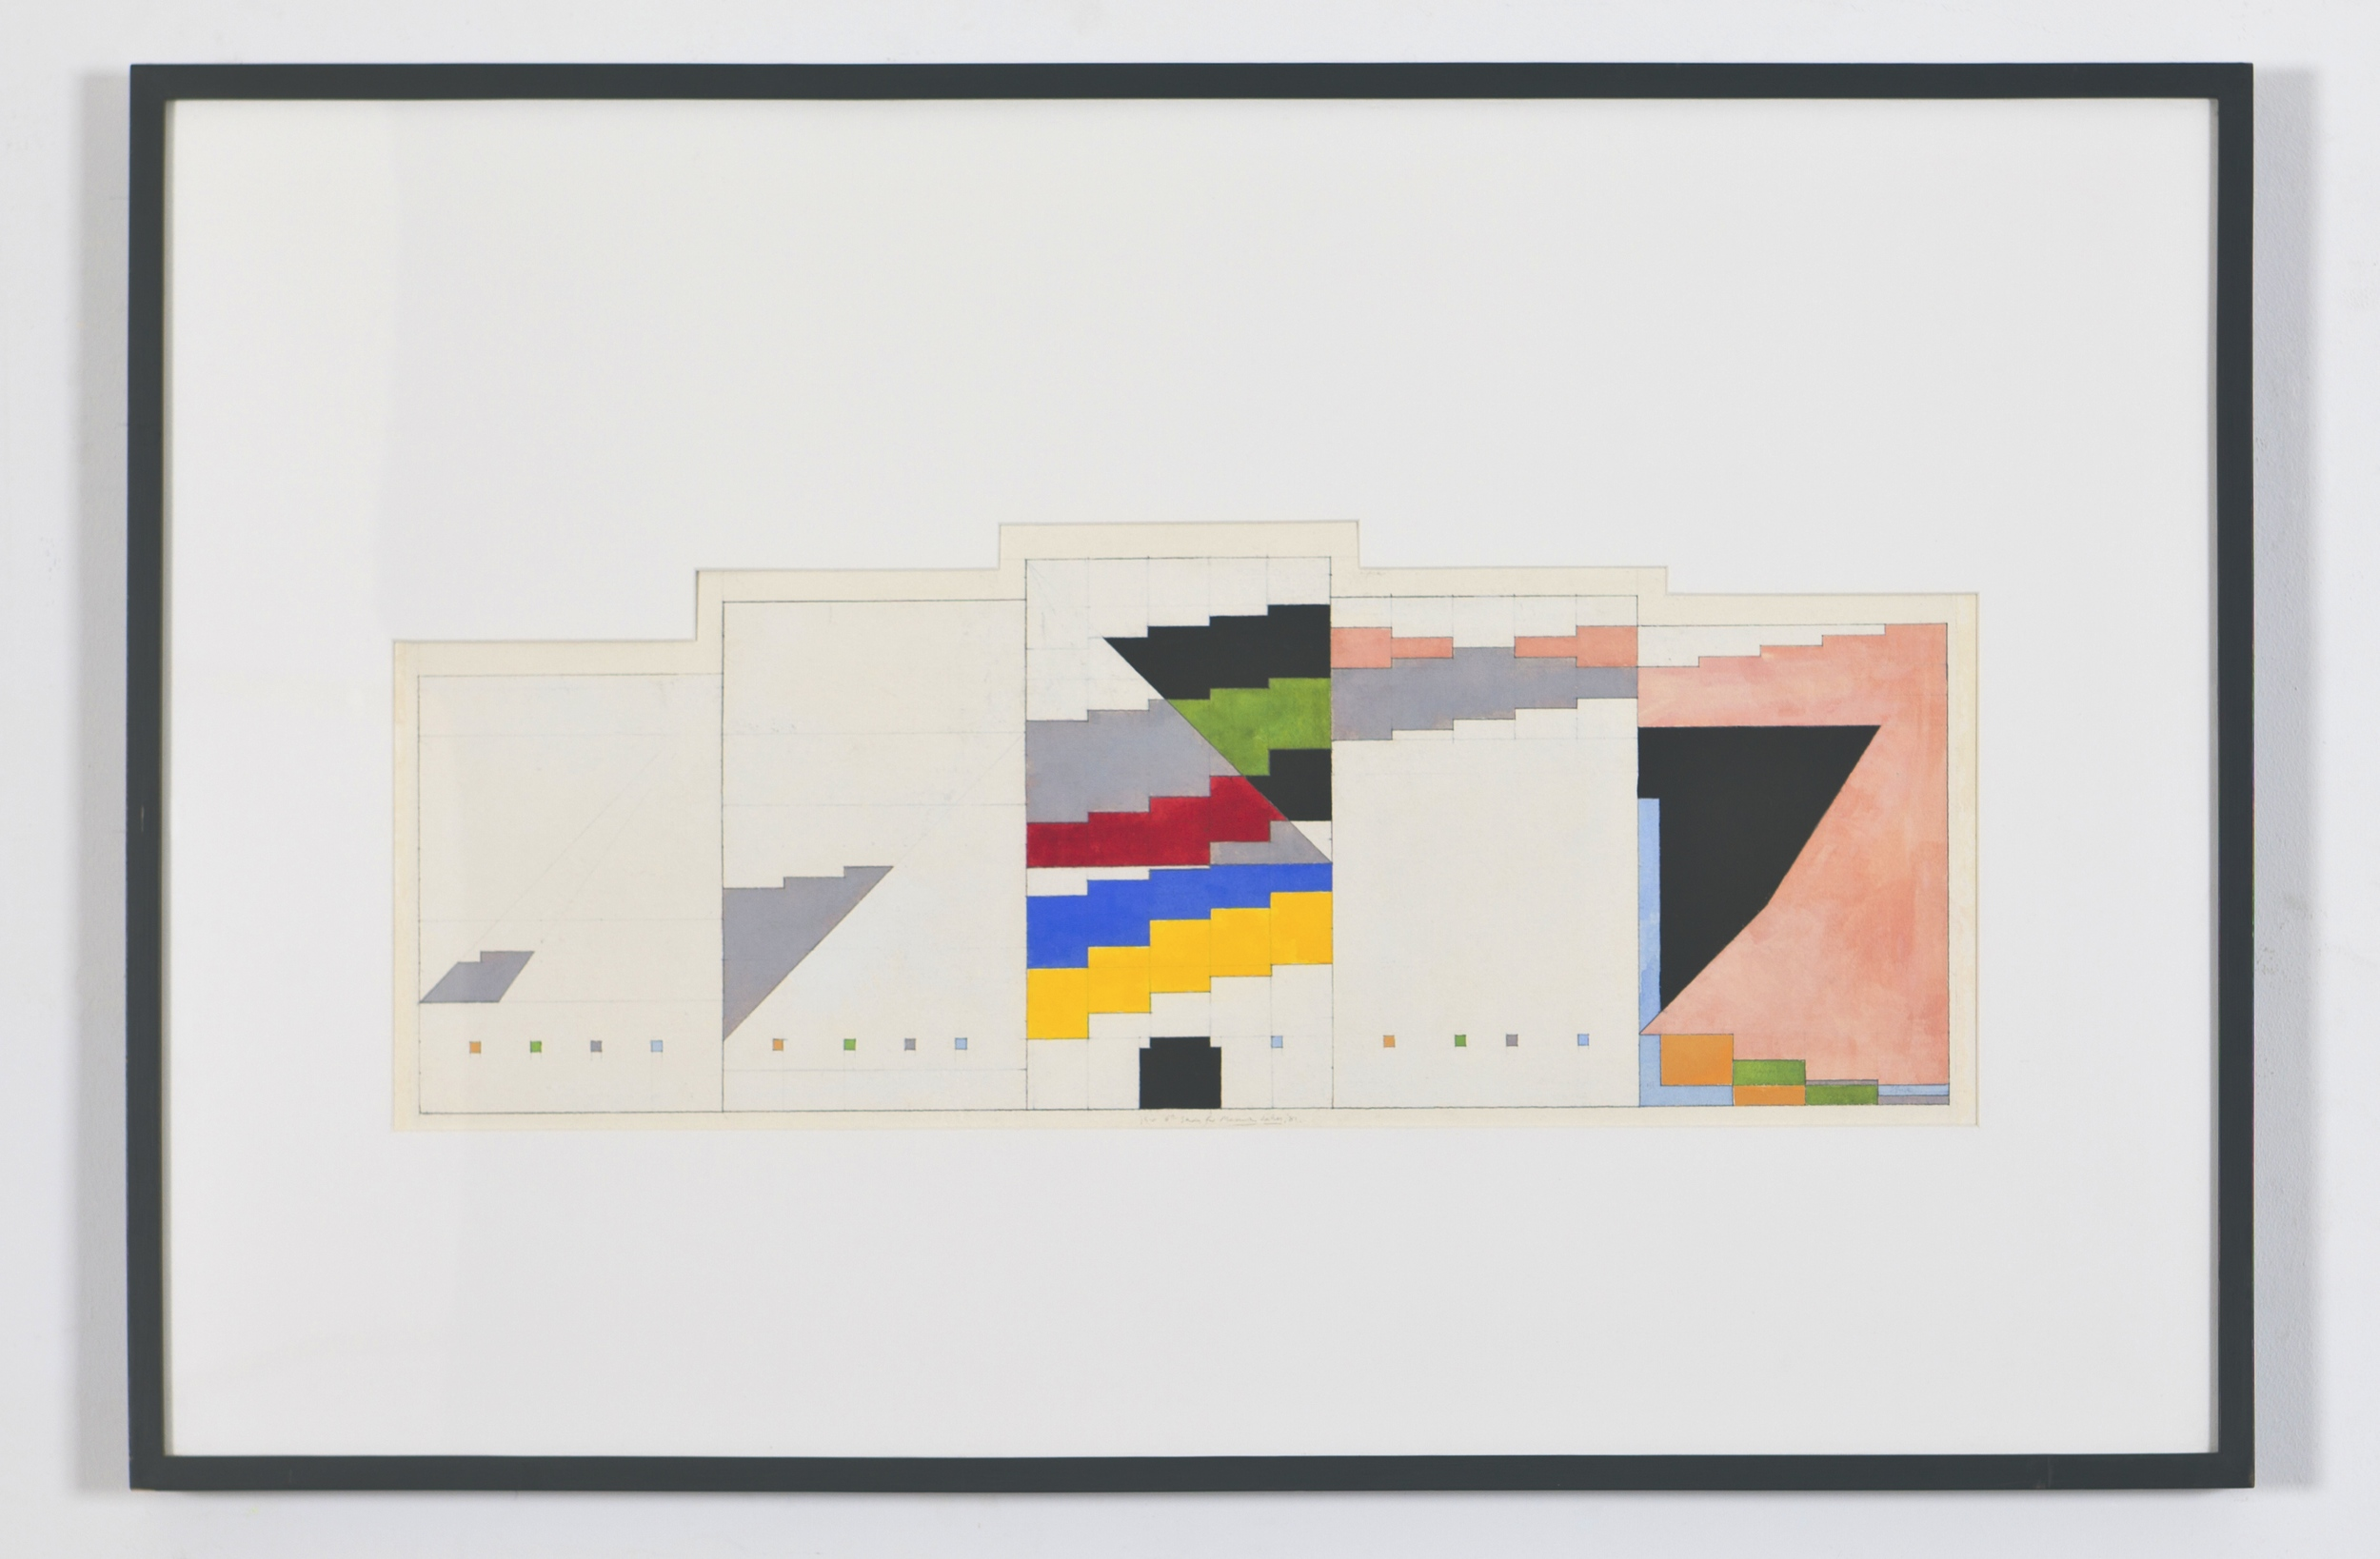 "Study for Masurian Lakes, 1981, gouache on paper. 11"" x 25 7/8"" (image), 25"" x 33"" (framed)"